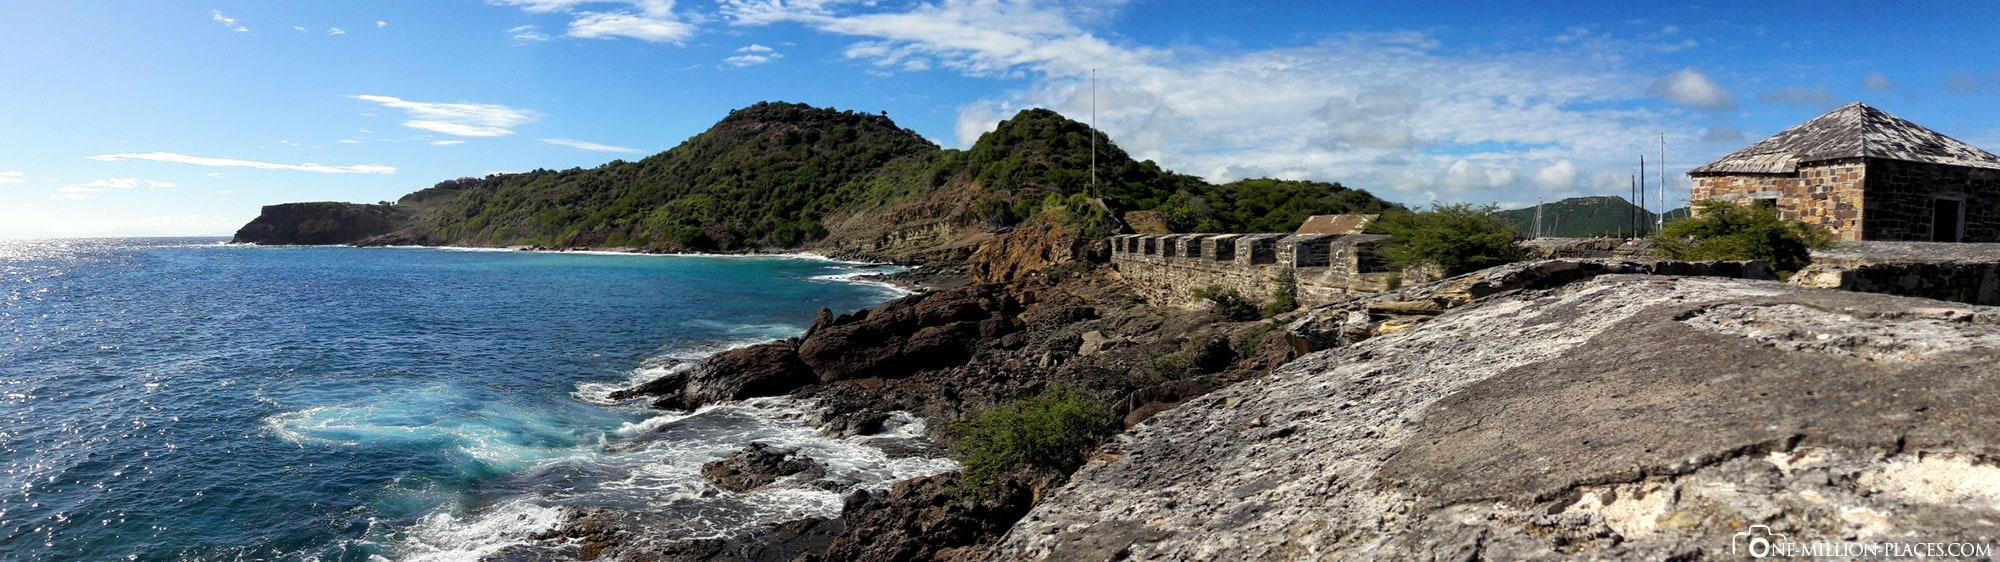 Fort Berkeley, Antigua, St. John's, Karibik, Welterbe, Sehenswürdigkeiten, Auf eigene Faust, Reisebericht